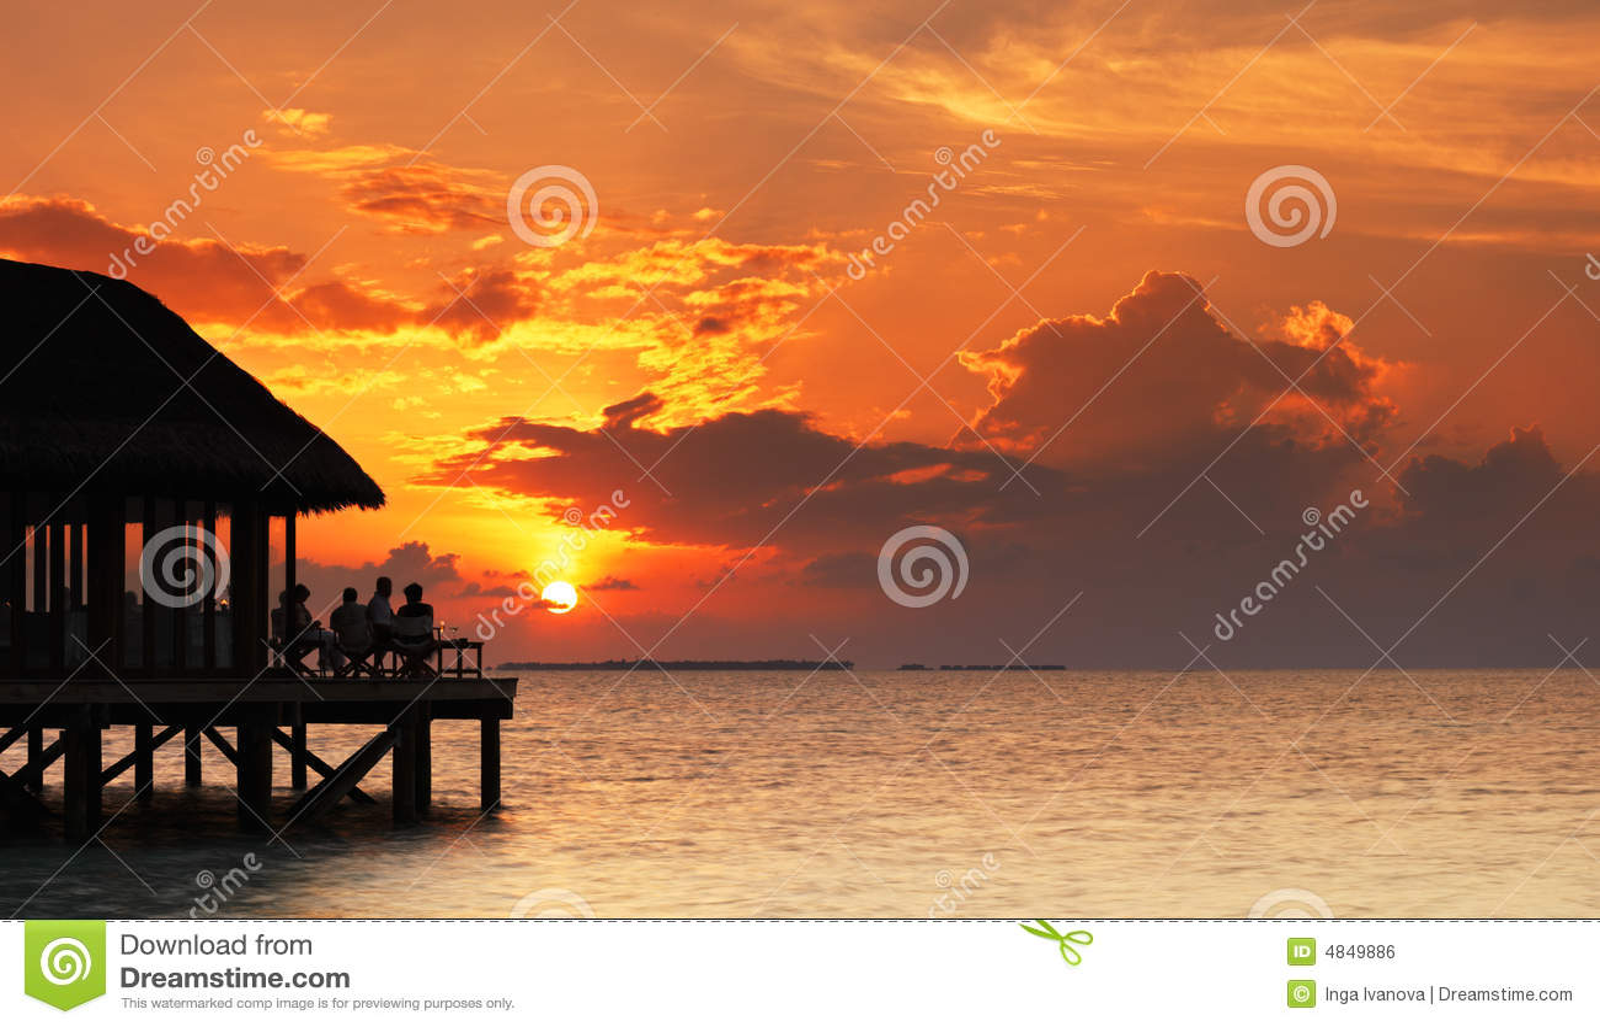 Restaurant over the ocean.